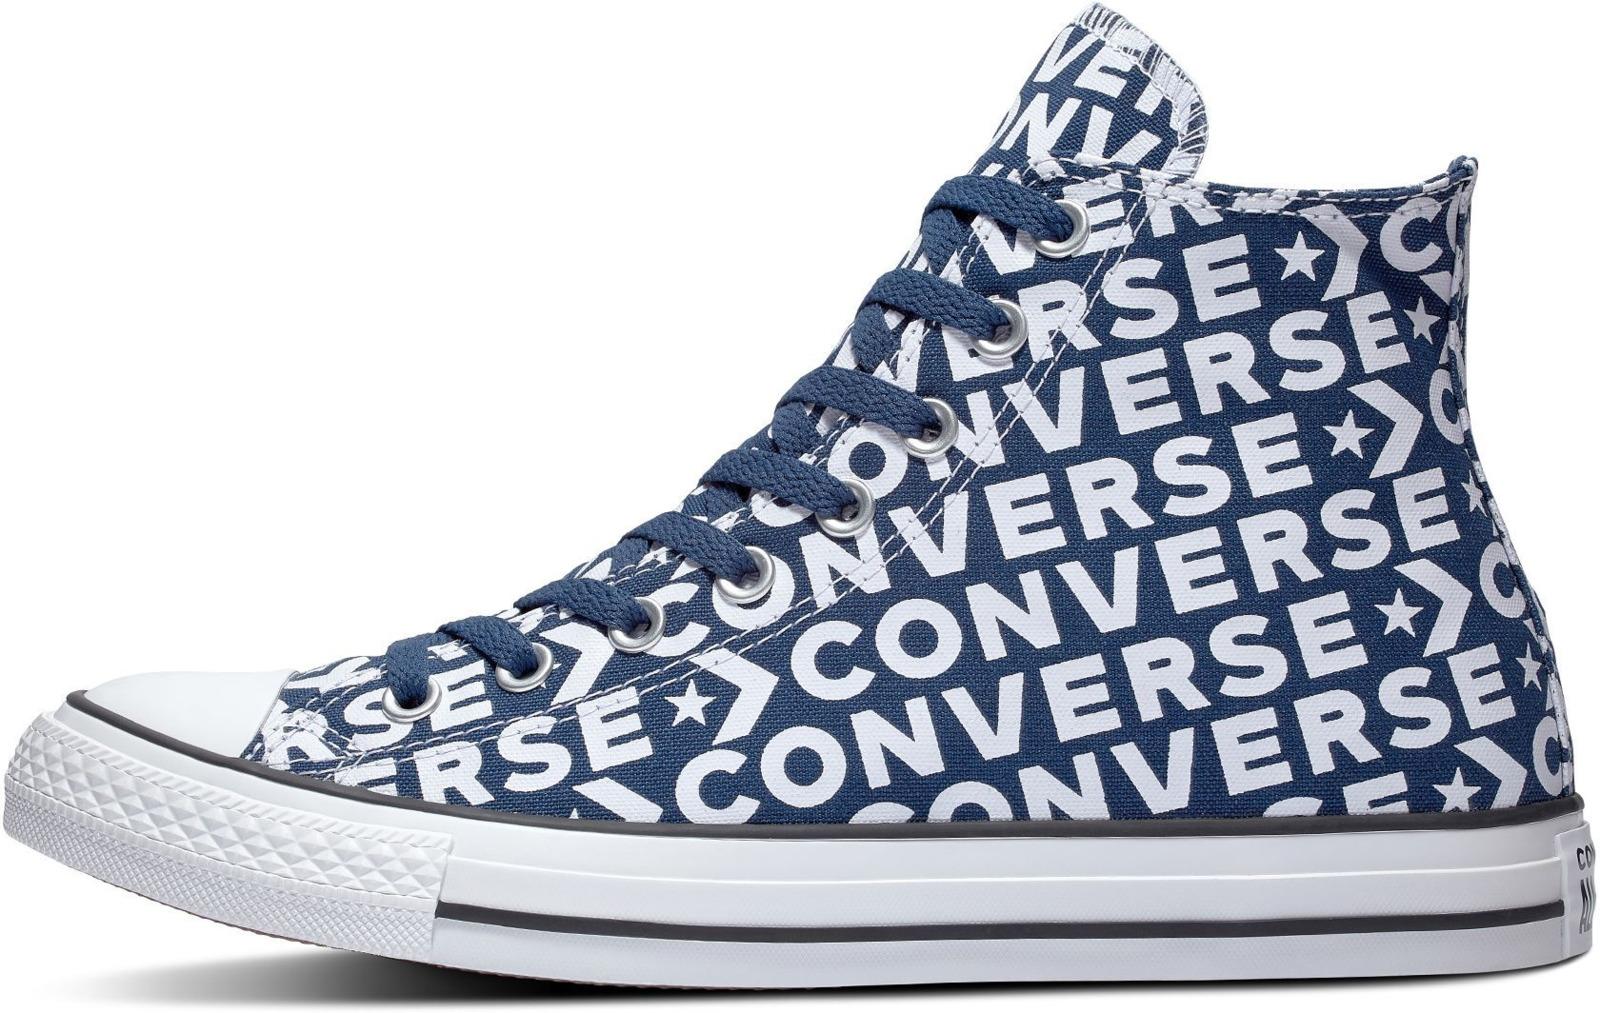 Кеды Converse Chuck Taylor All Star кеды женские converse chuck taylor all star цвет синий 163303 размер 5 37 5